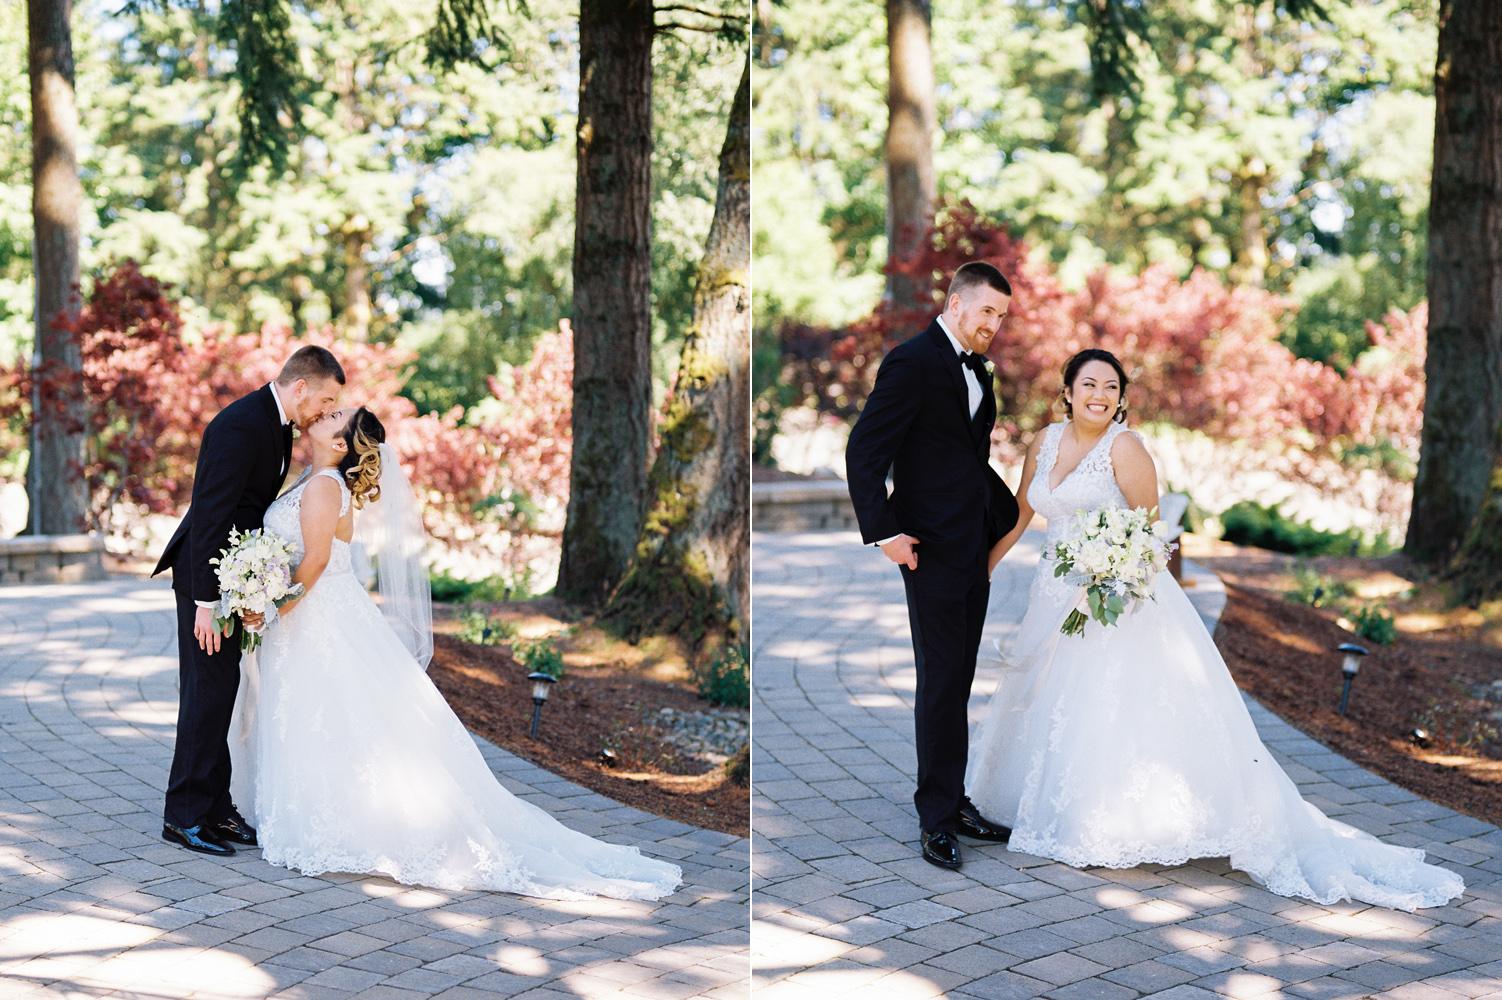 formal bride and groom at the empress estates washington wedding.jpg